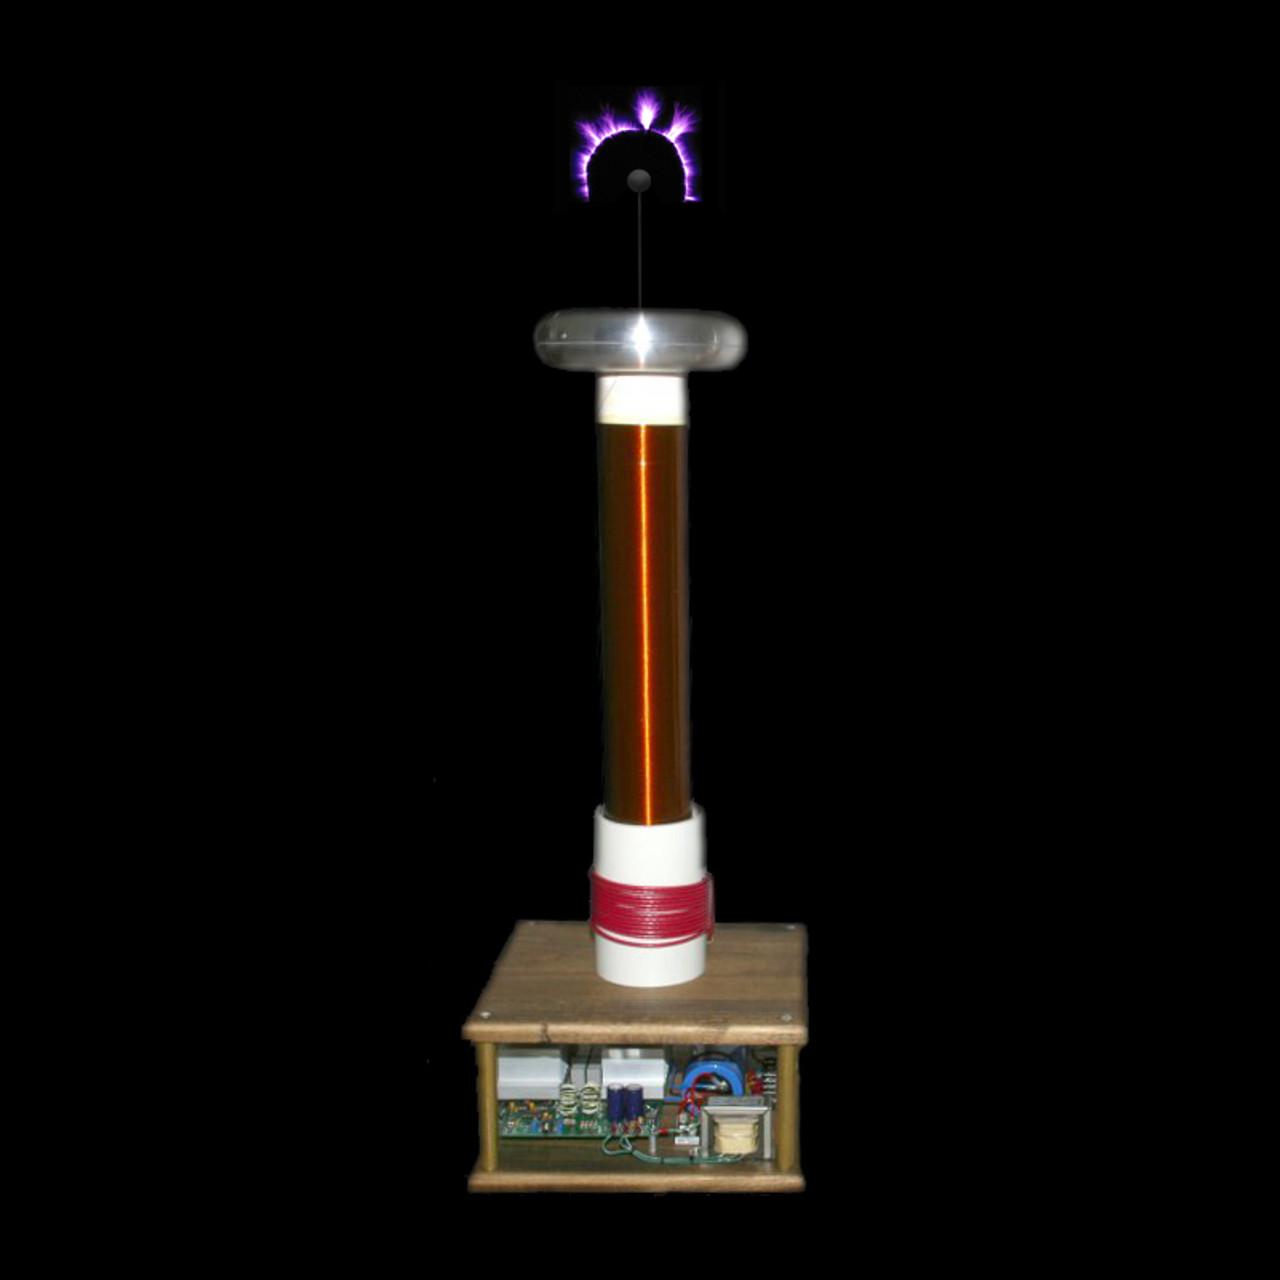 Plasmasonic CW Plasma Speaker system